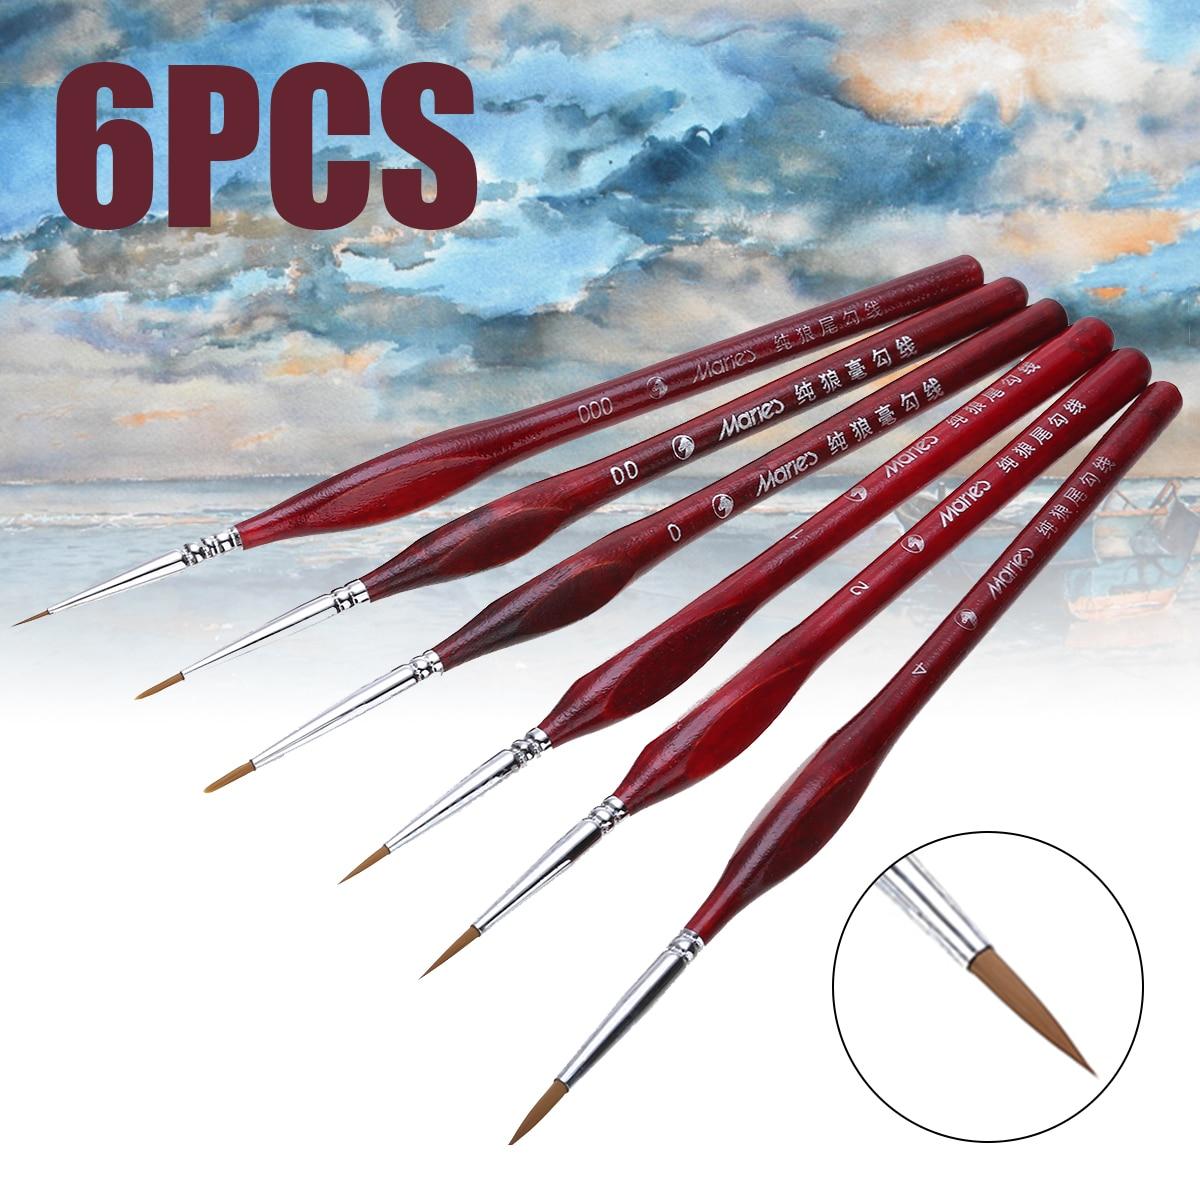 6Pcs Paint Brush Set Extra Fine Detail Brushes Artist Miniatures Model Maker Tool for Oil Painting Gouache